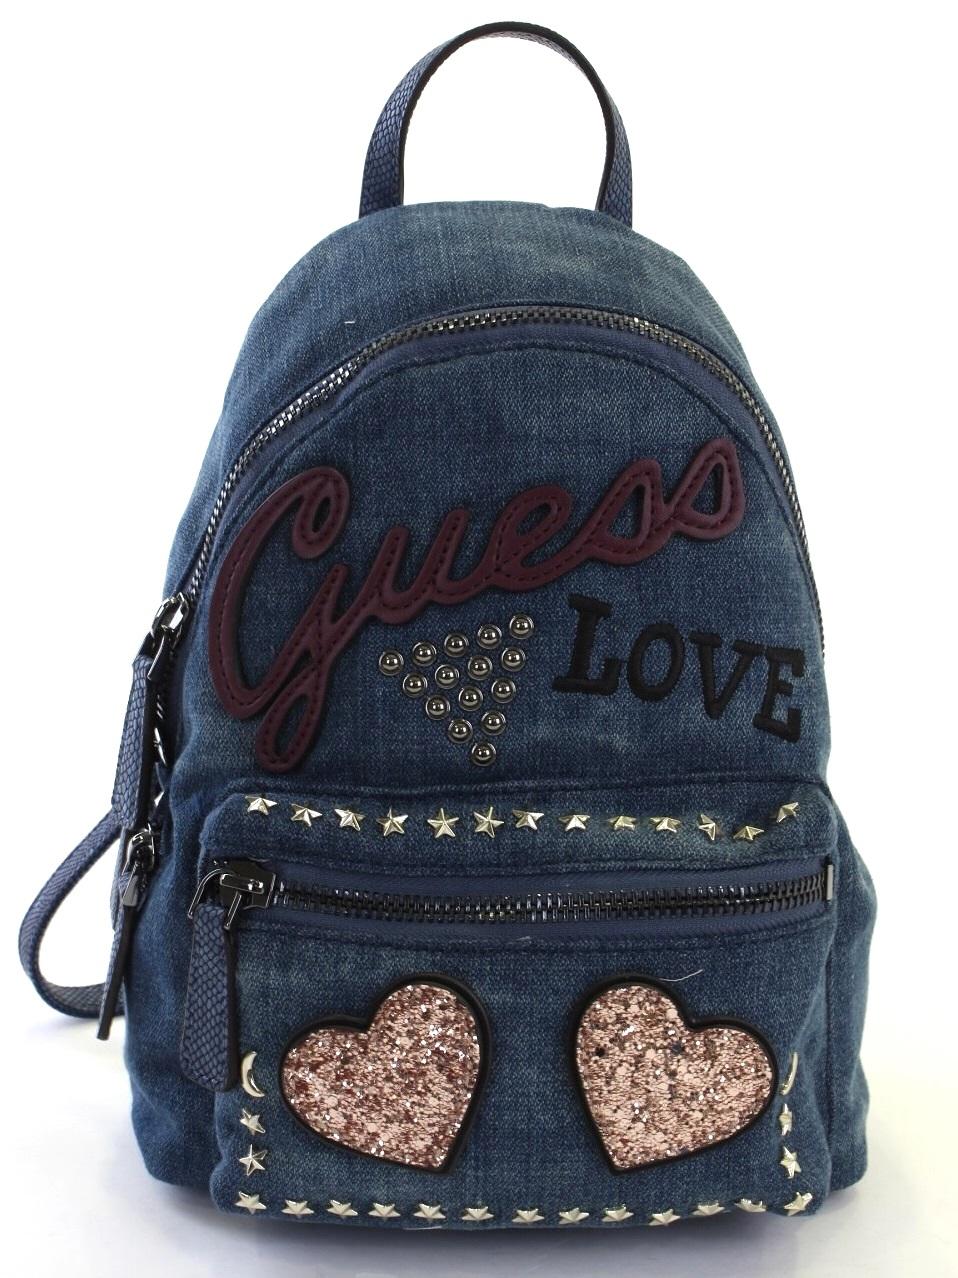 Backpack Guess 465 HWED71 09310 Glispe Store